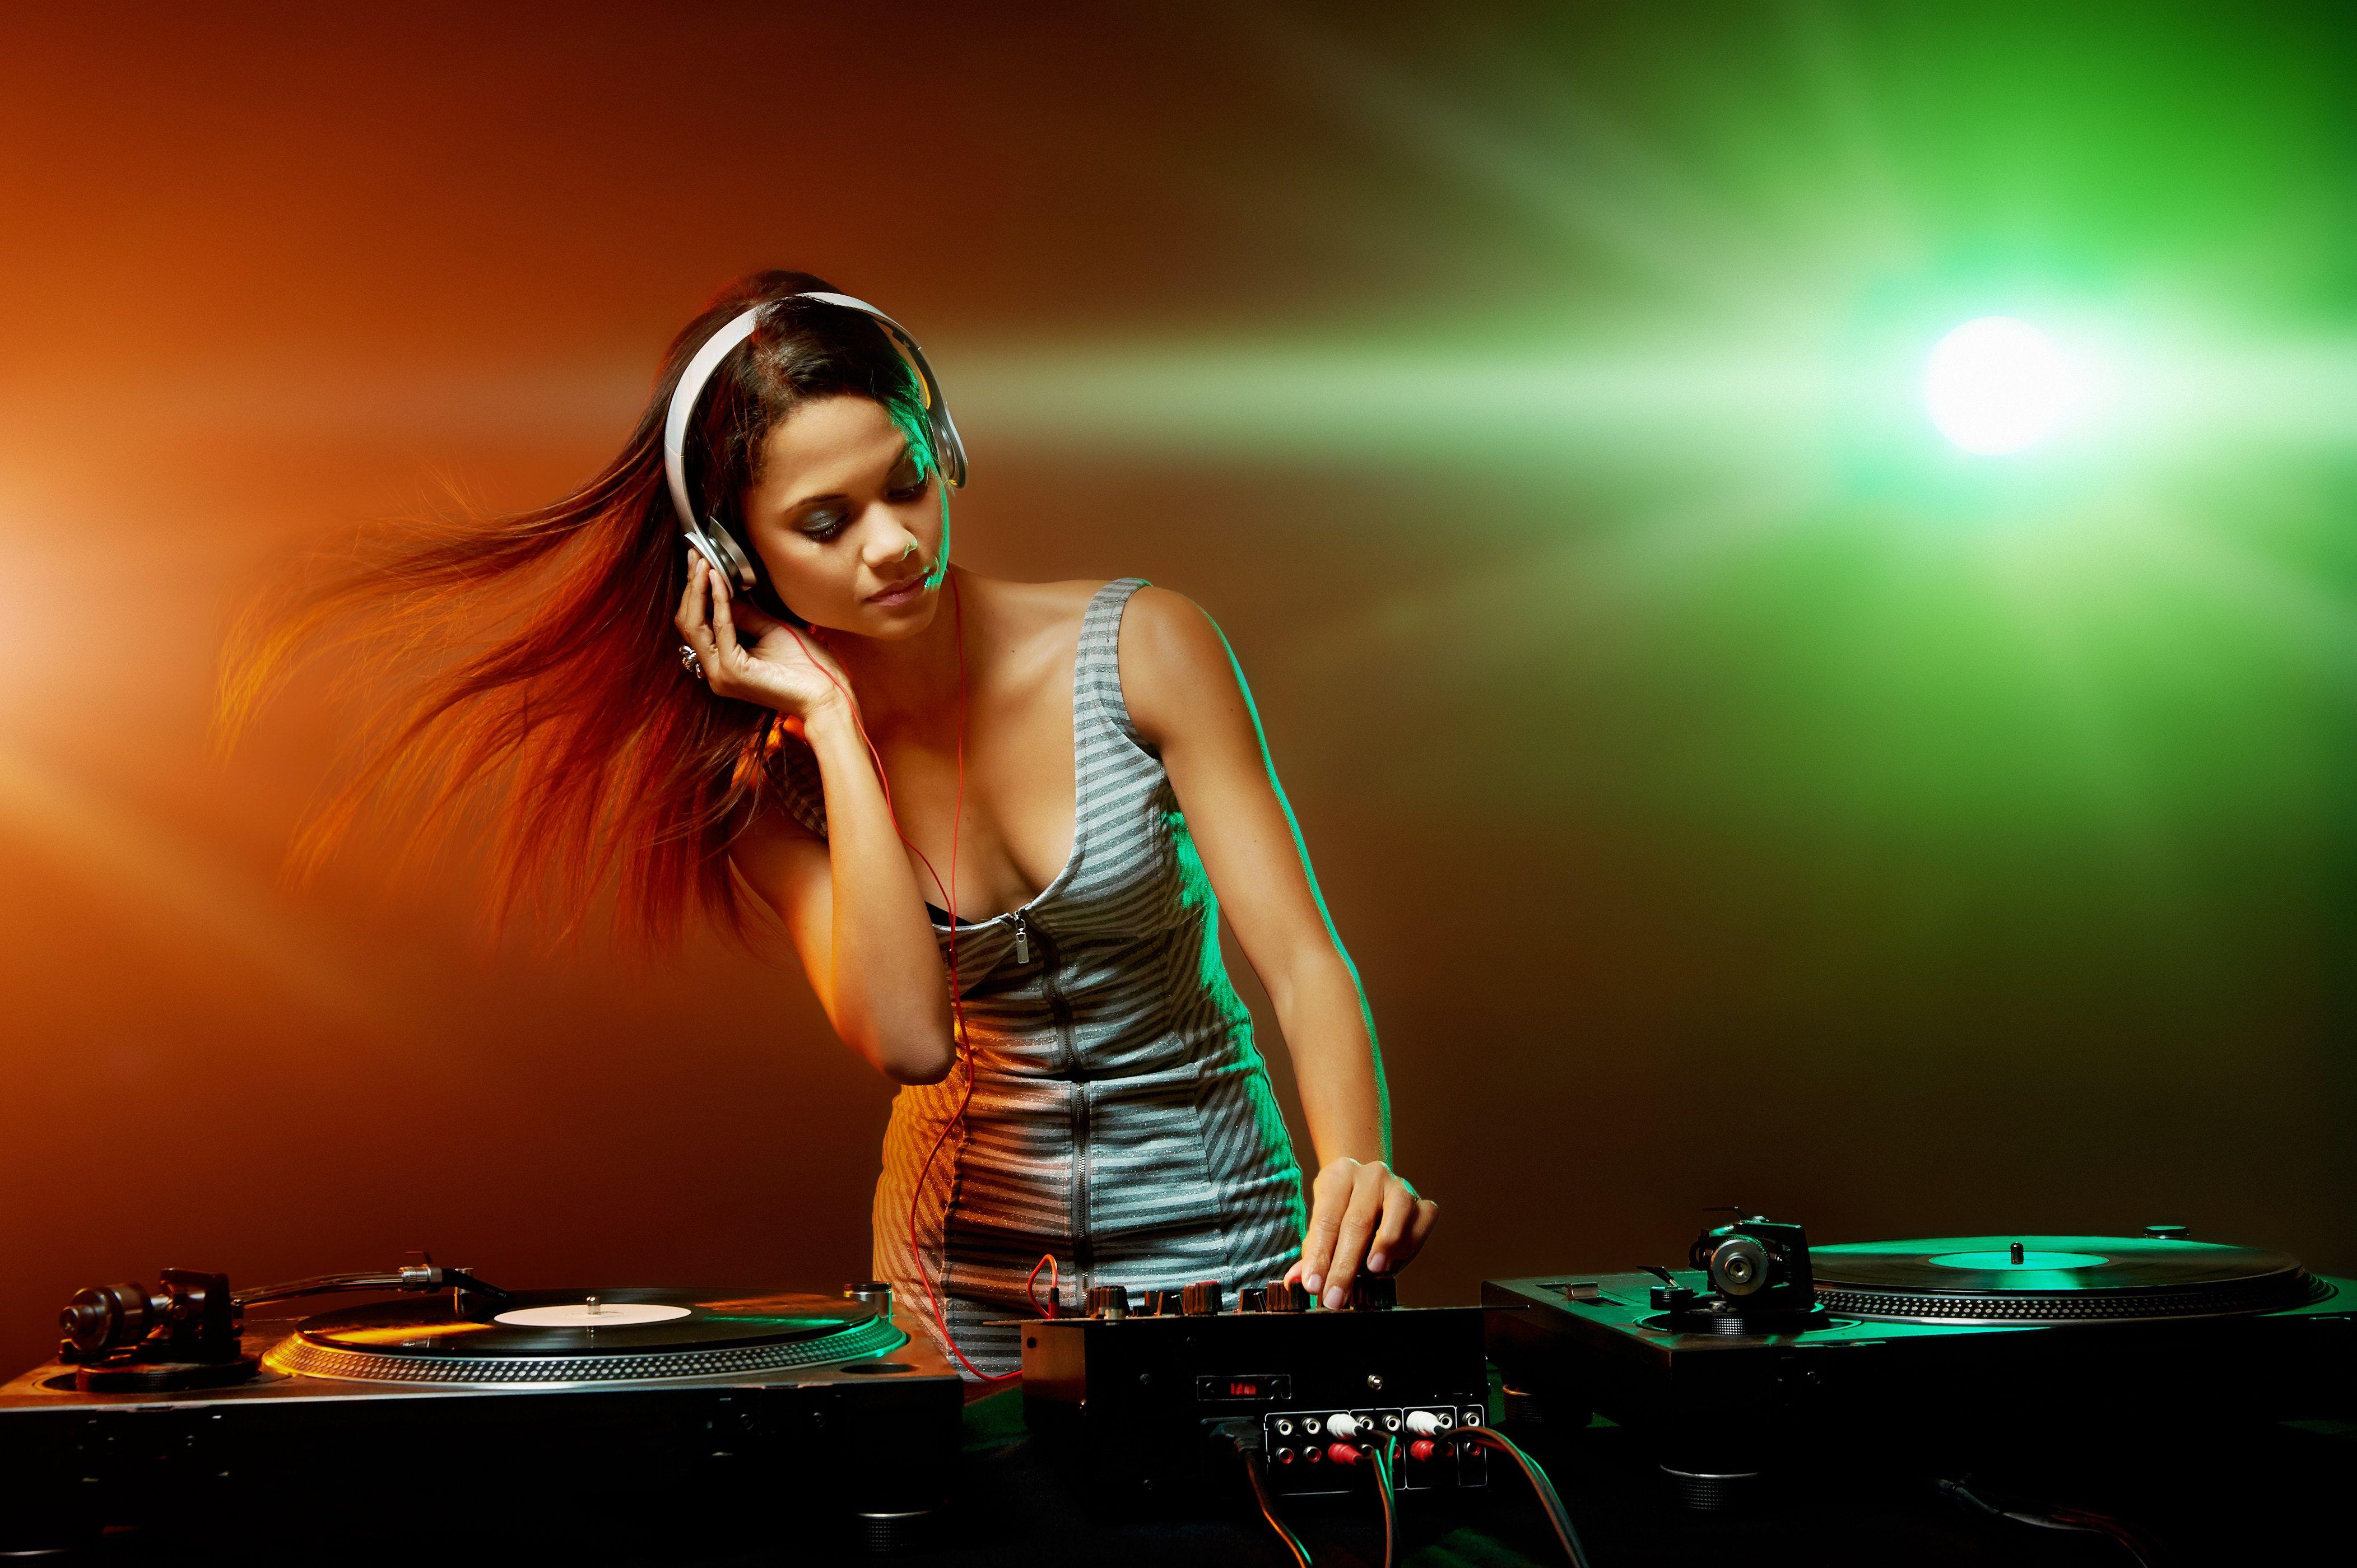 Hot Beautiful Girl Like Dj Black Stock Photo